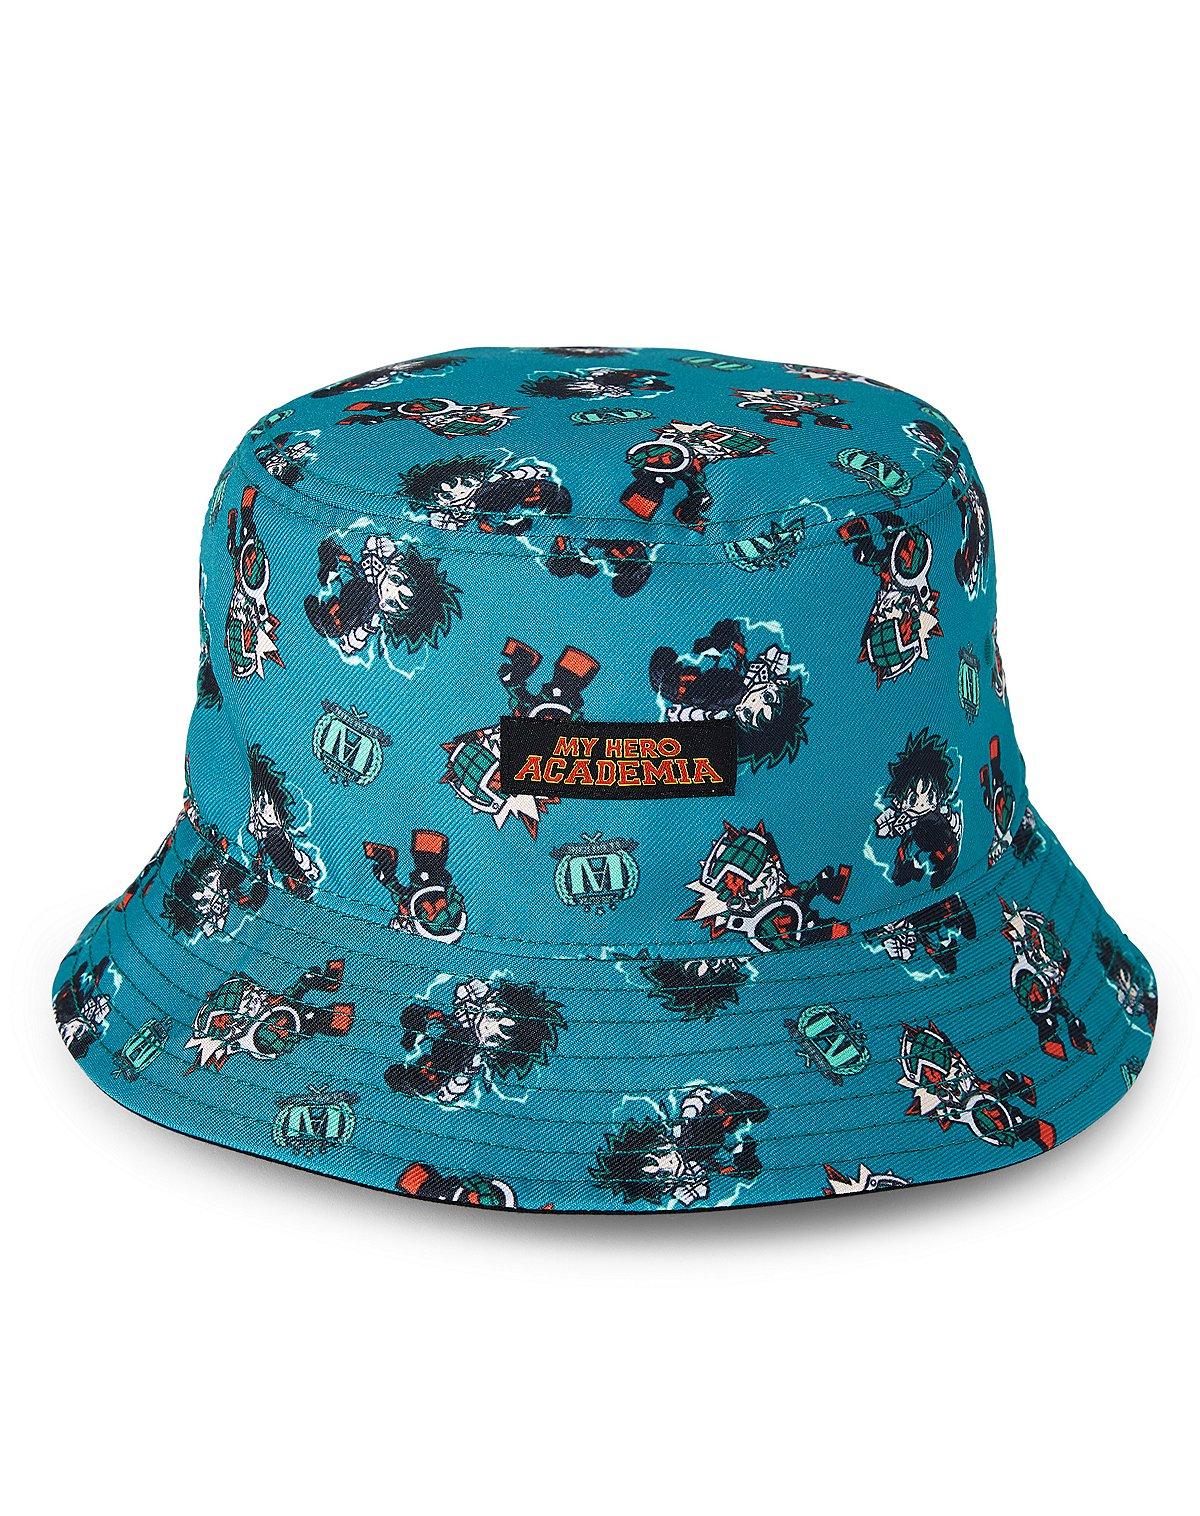 Chibi Bucket Hat